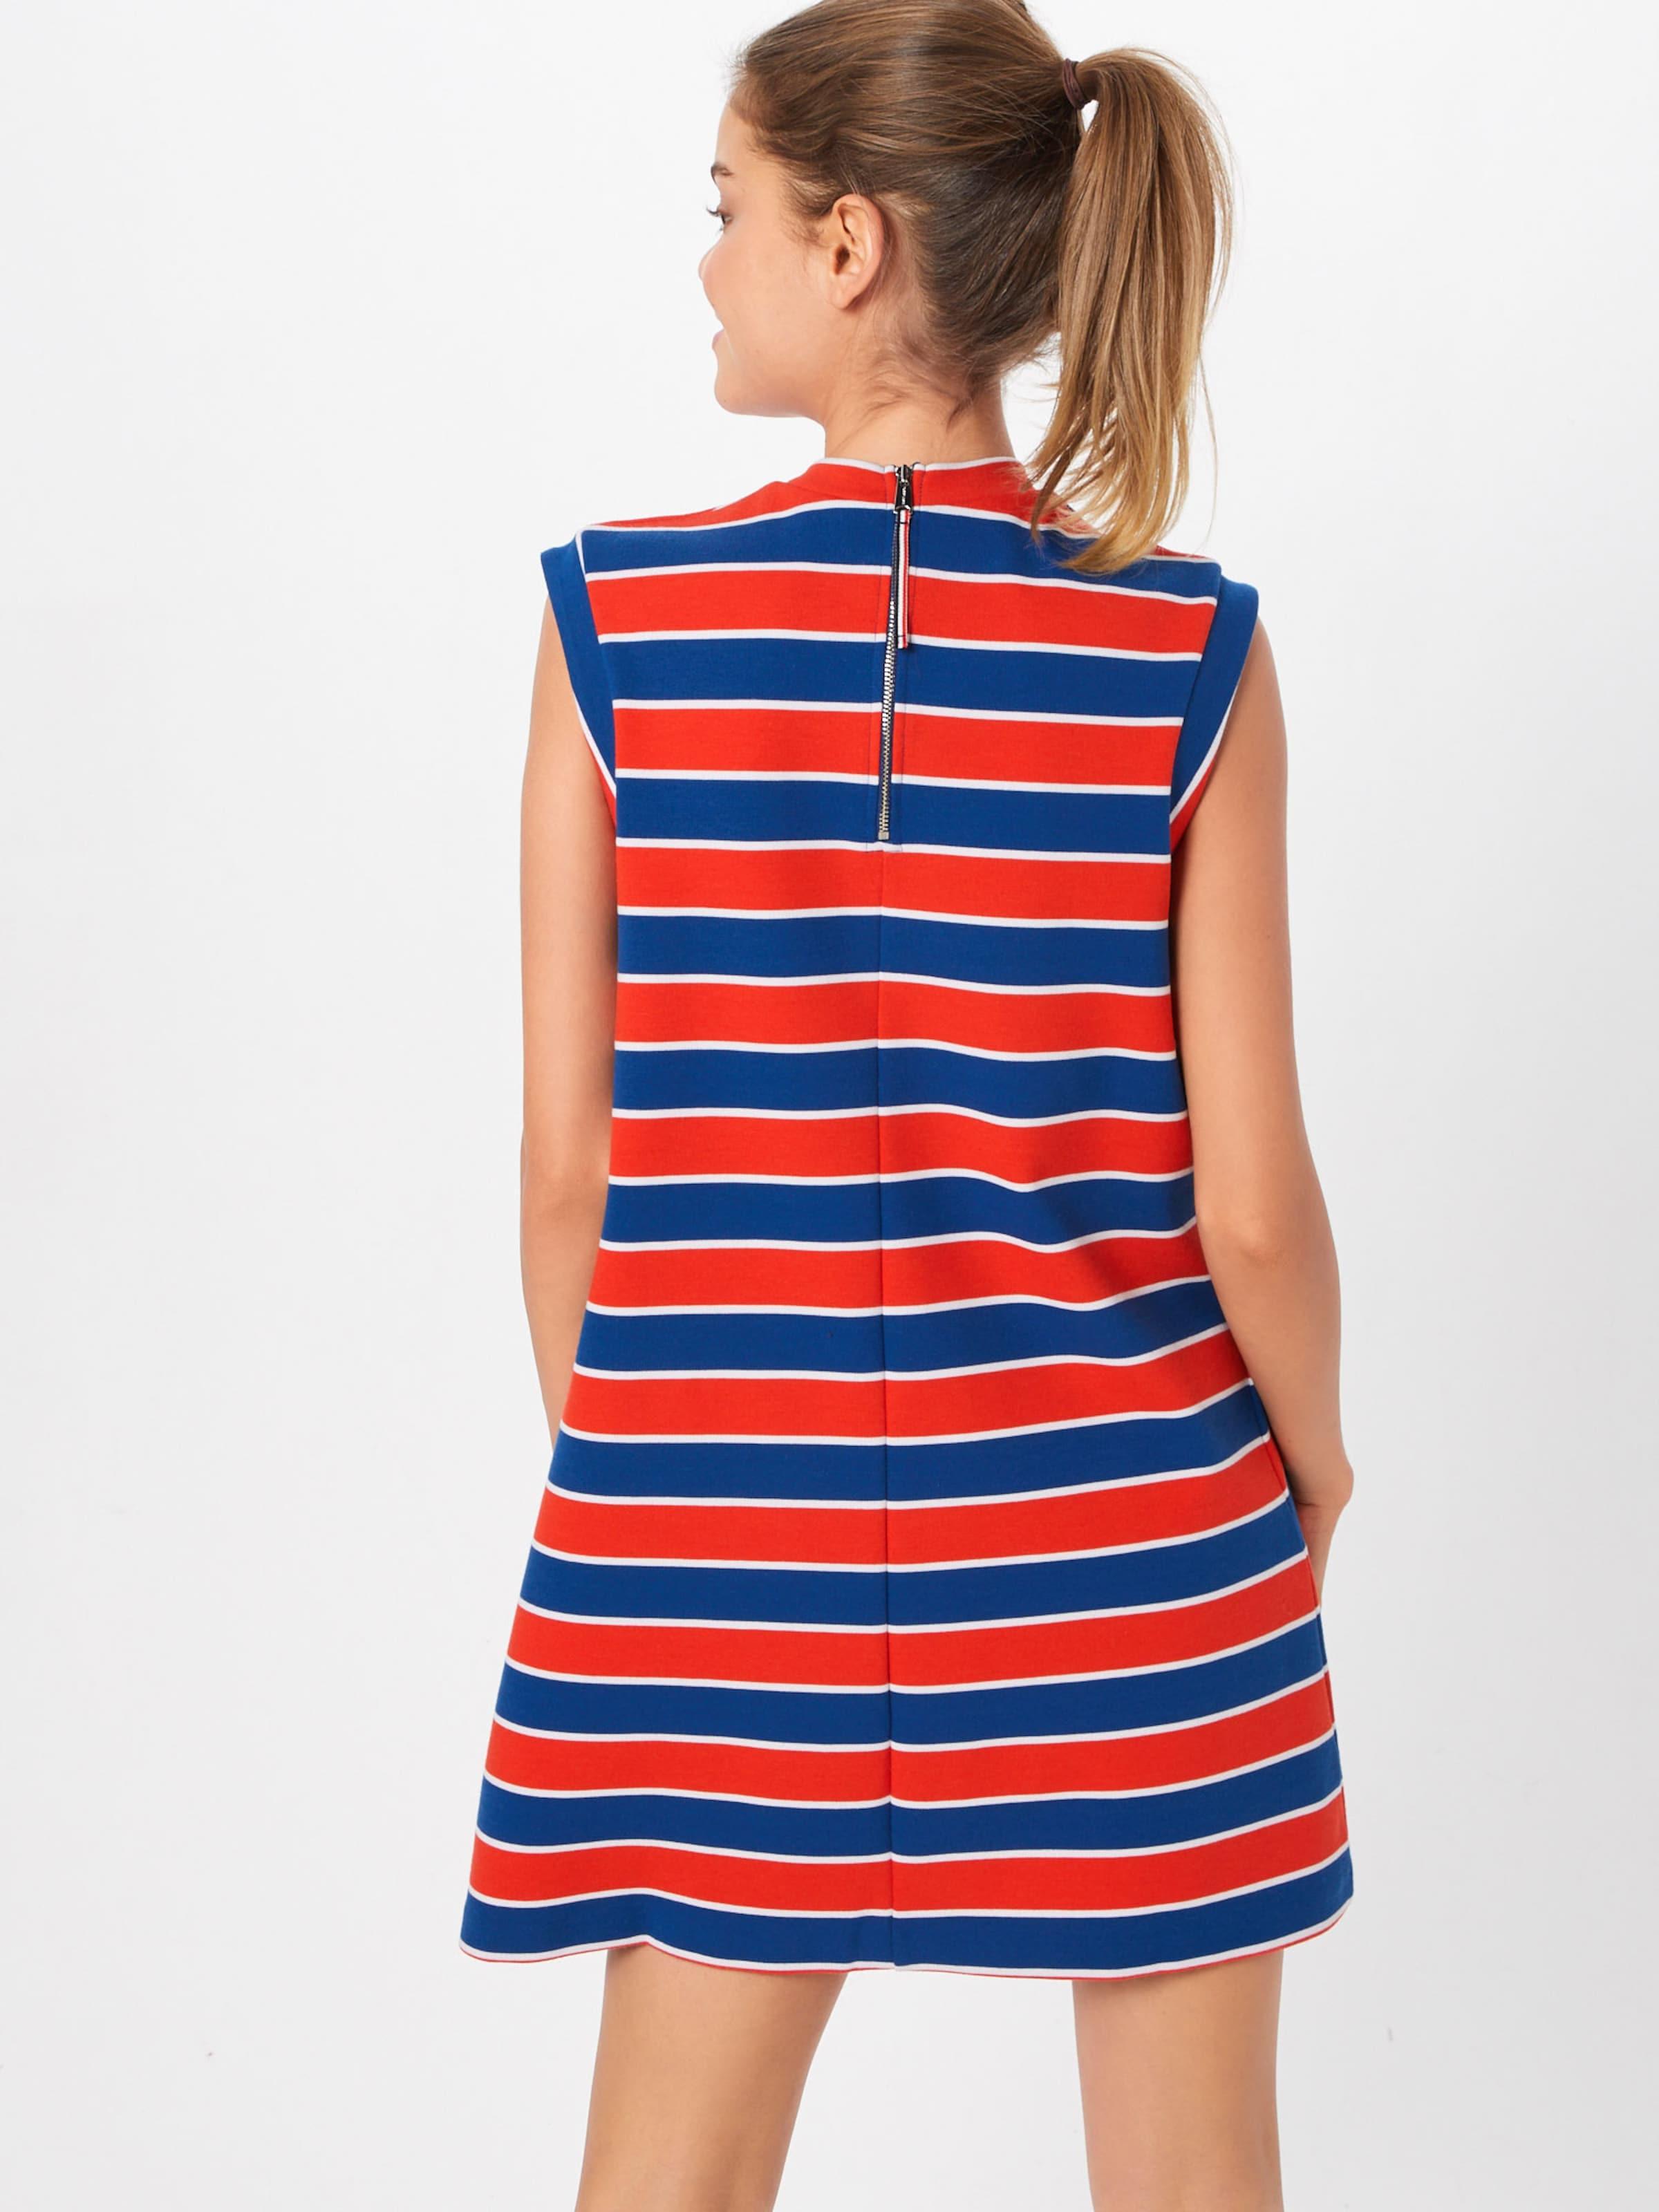 BlauRot A Kleid 'tjw In line' Tommy Jeans W9YIDHE2